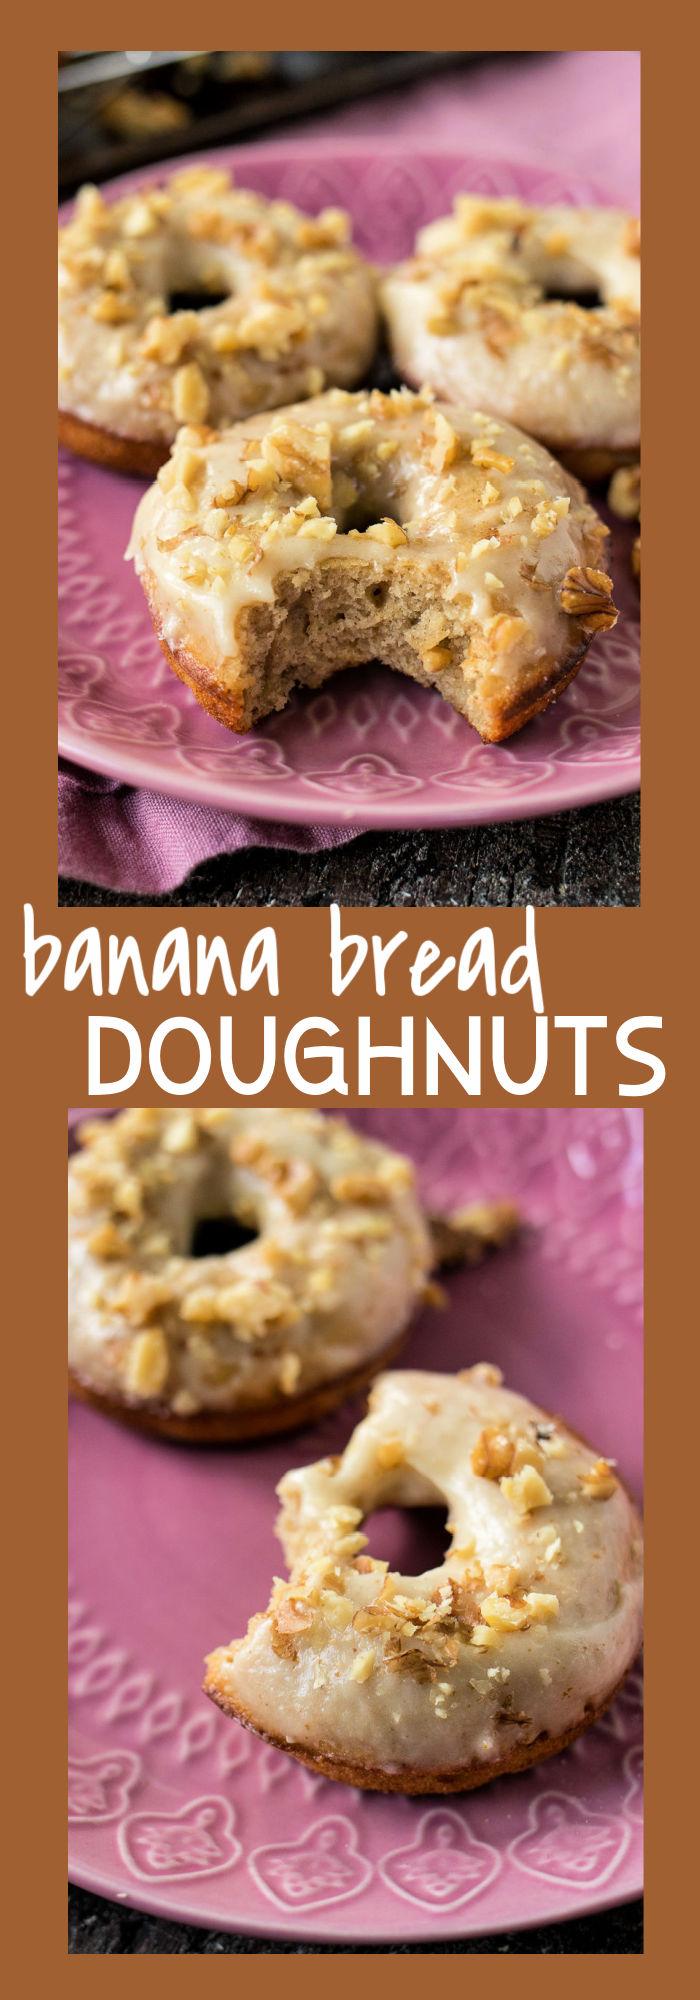 Banana Bread Doughnuts photo collage